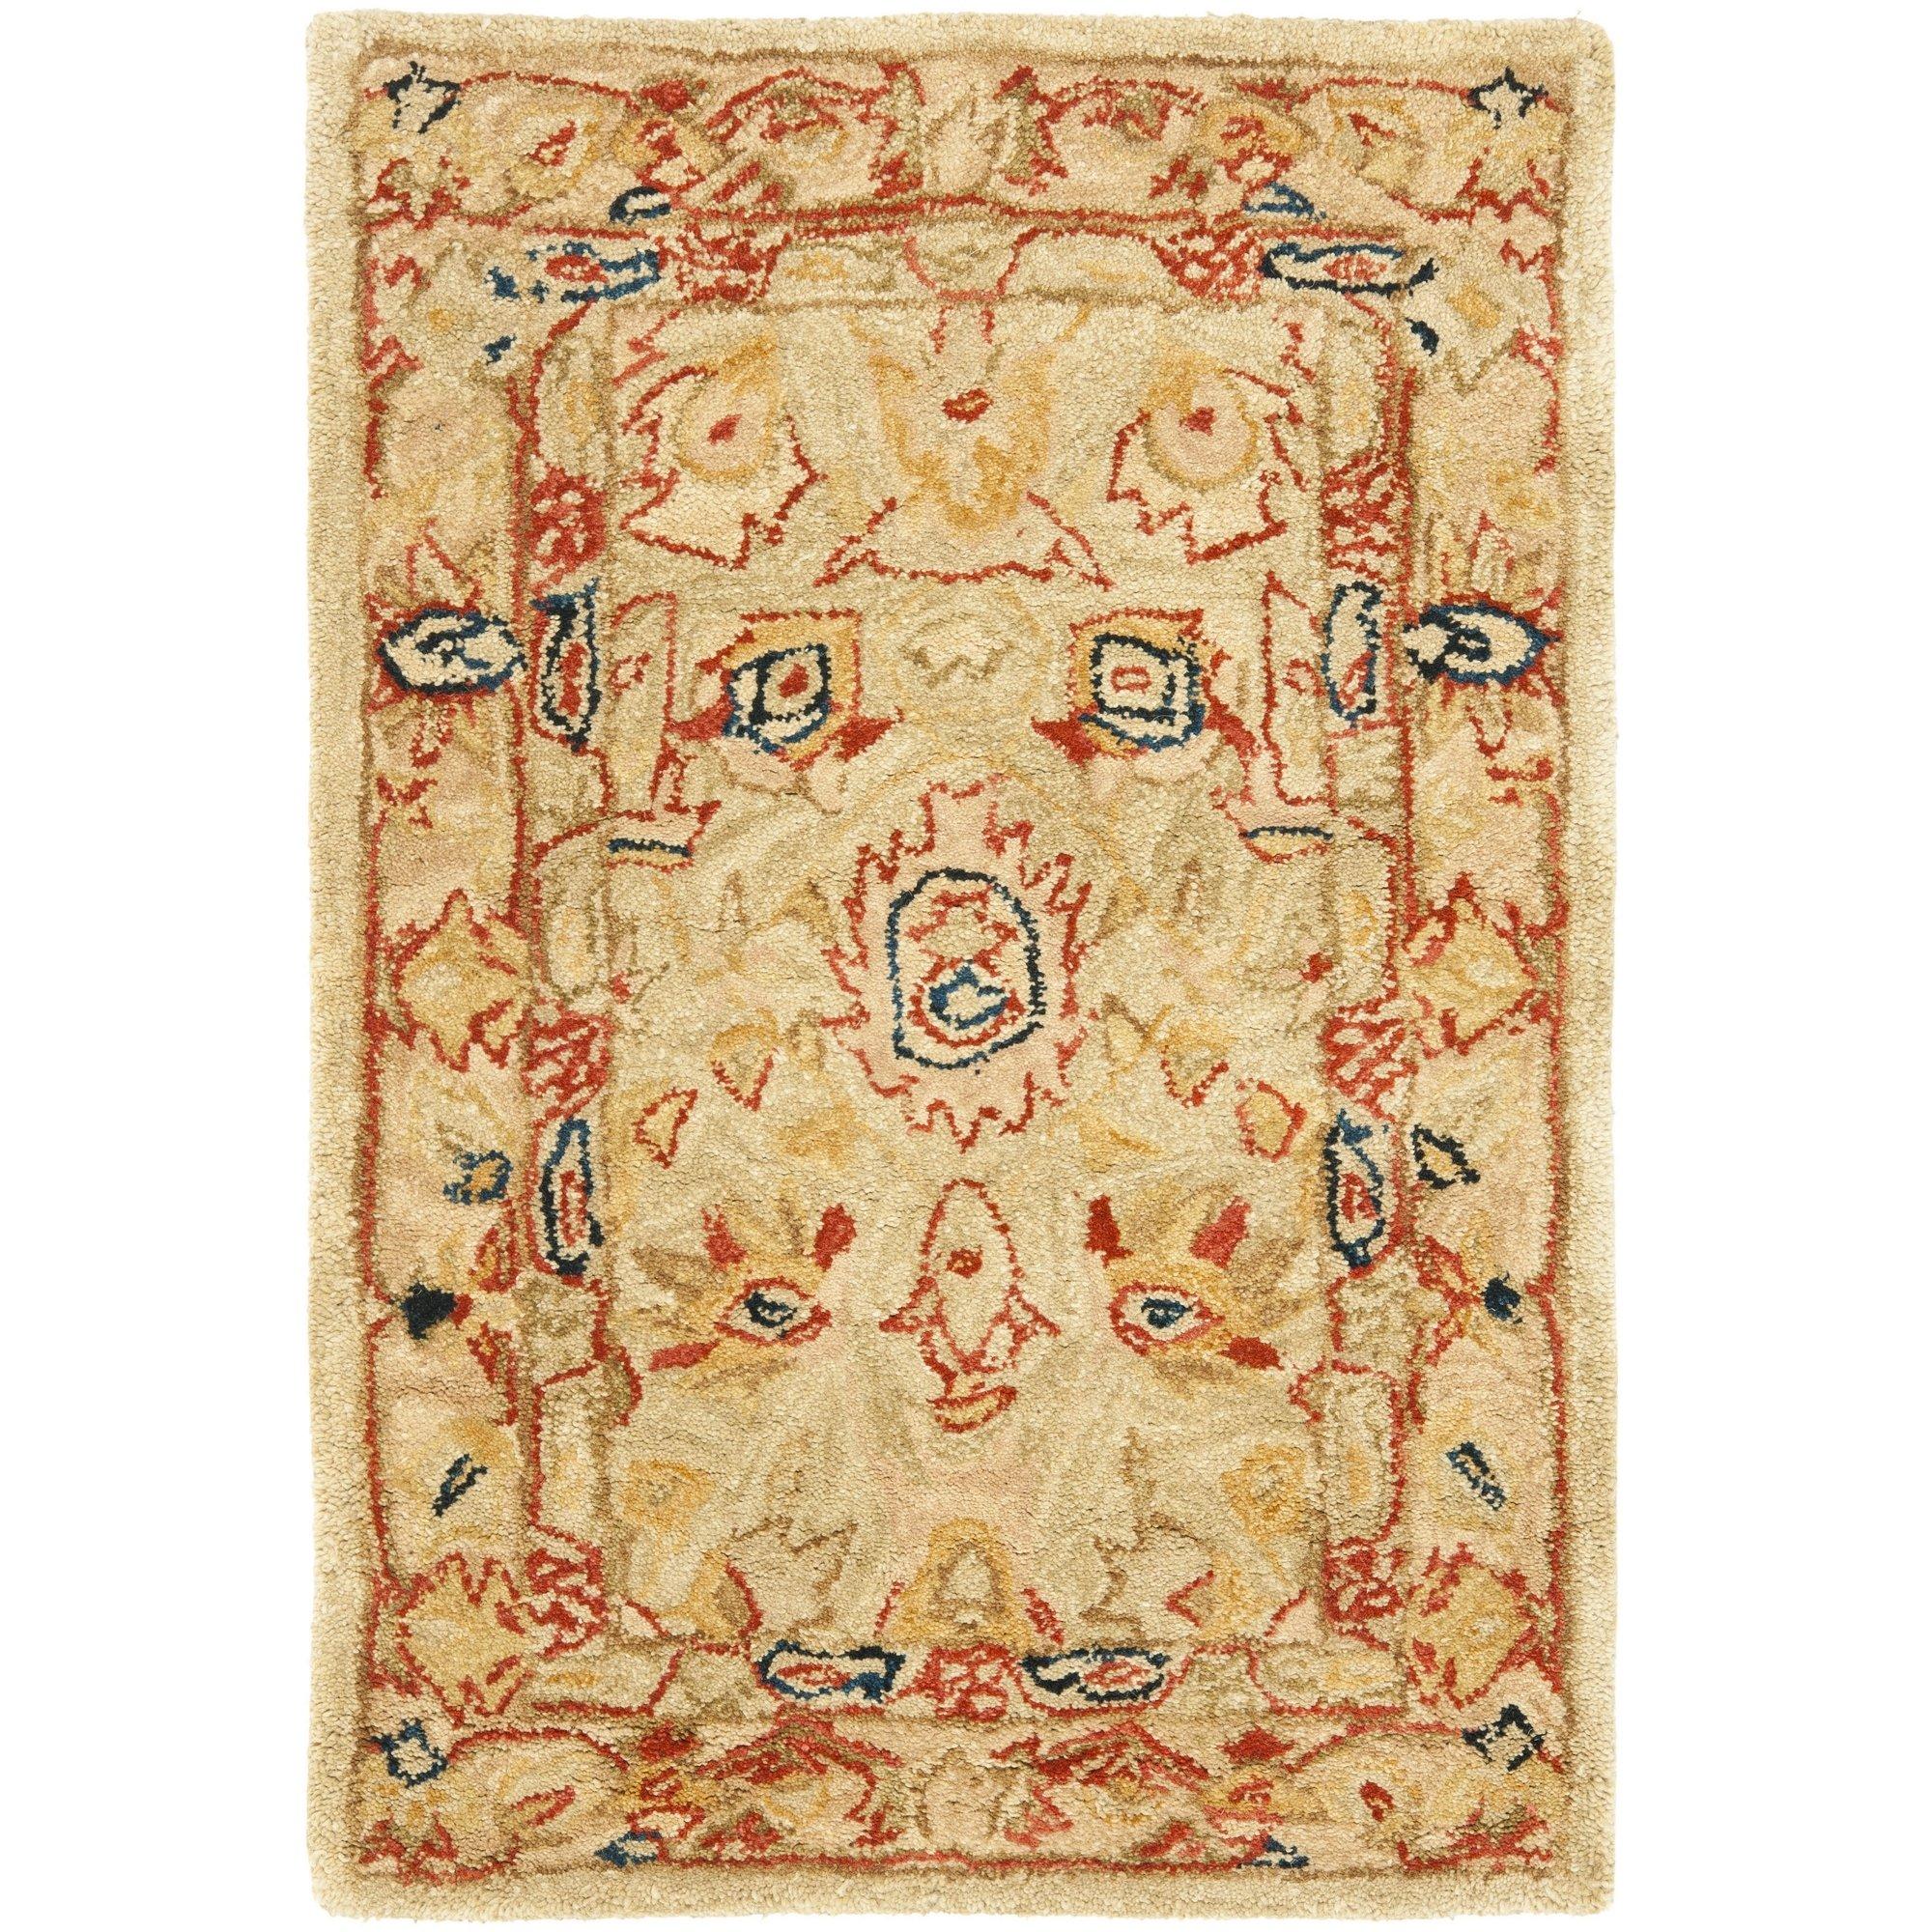 Area Rug Persian 9x12 Oriental Carpet Ivory Wool: 9x12 Rug Wool Beige: Amazon.com